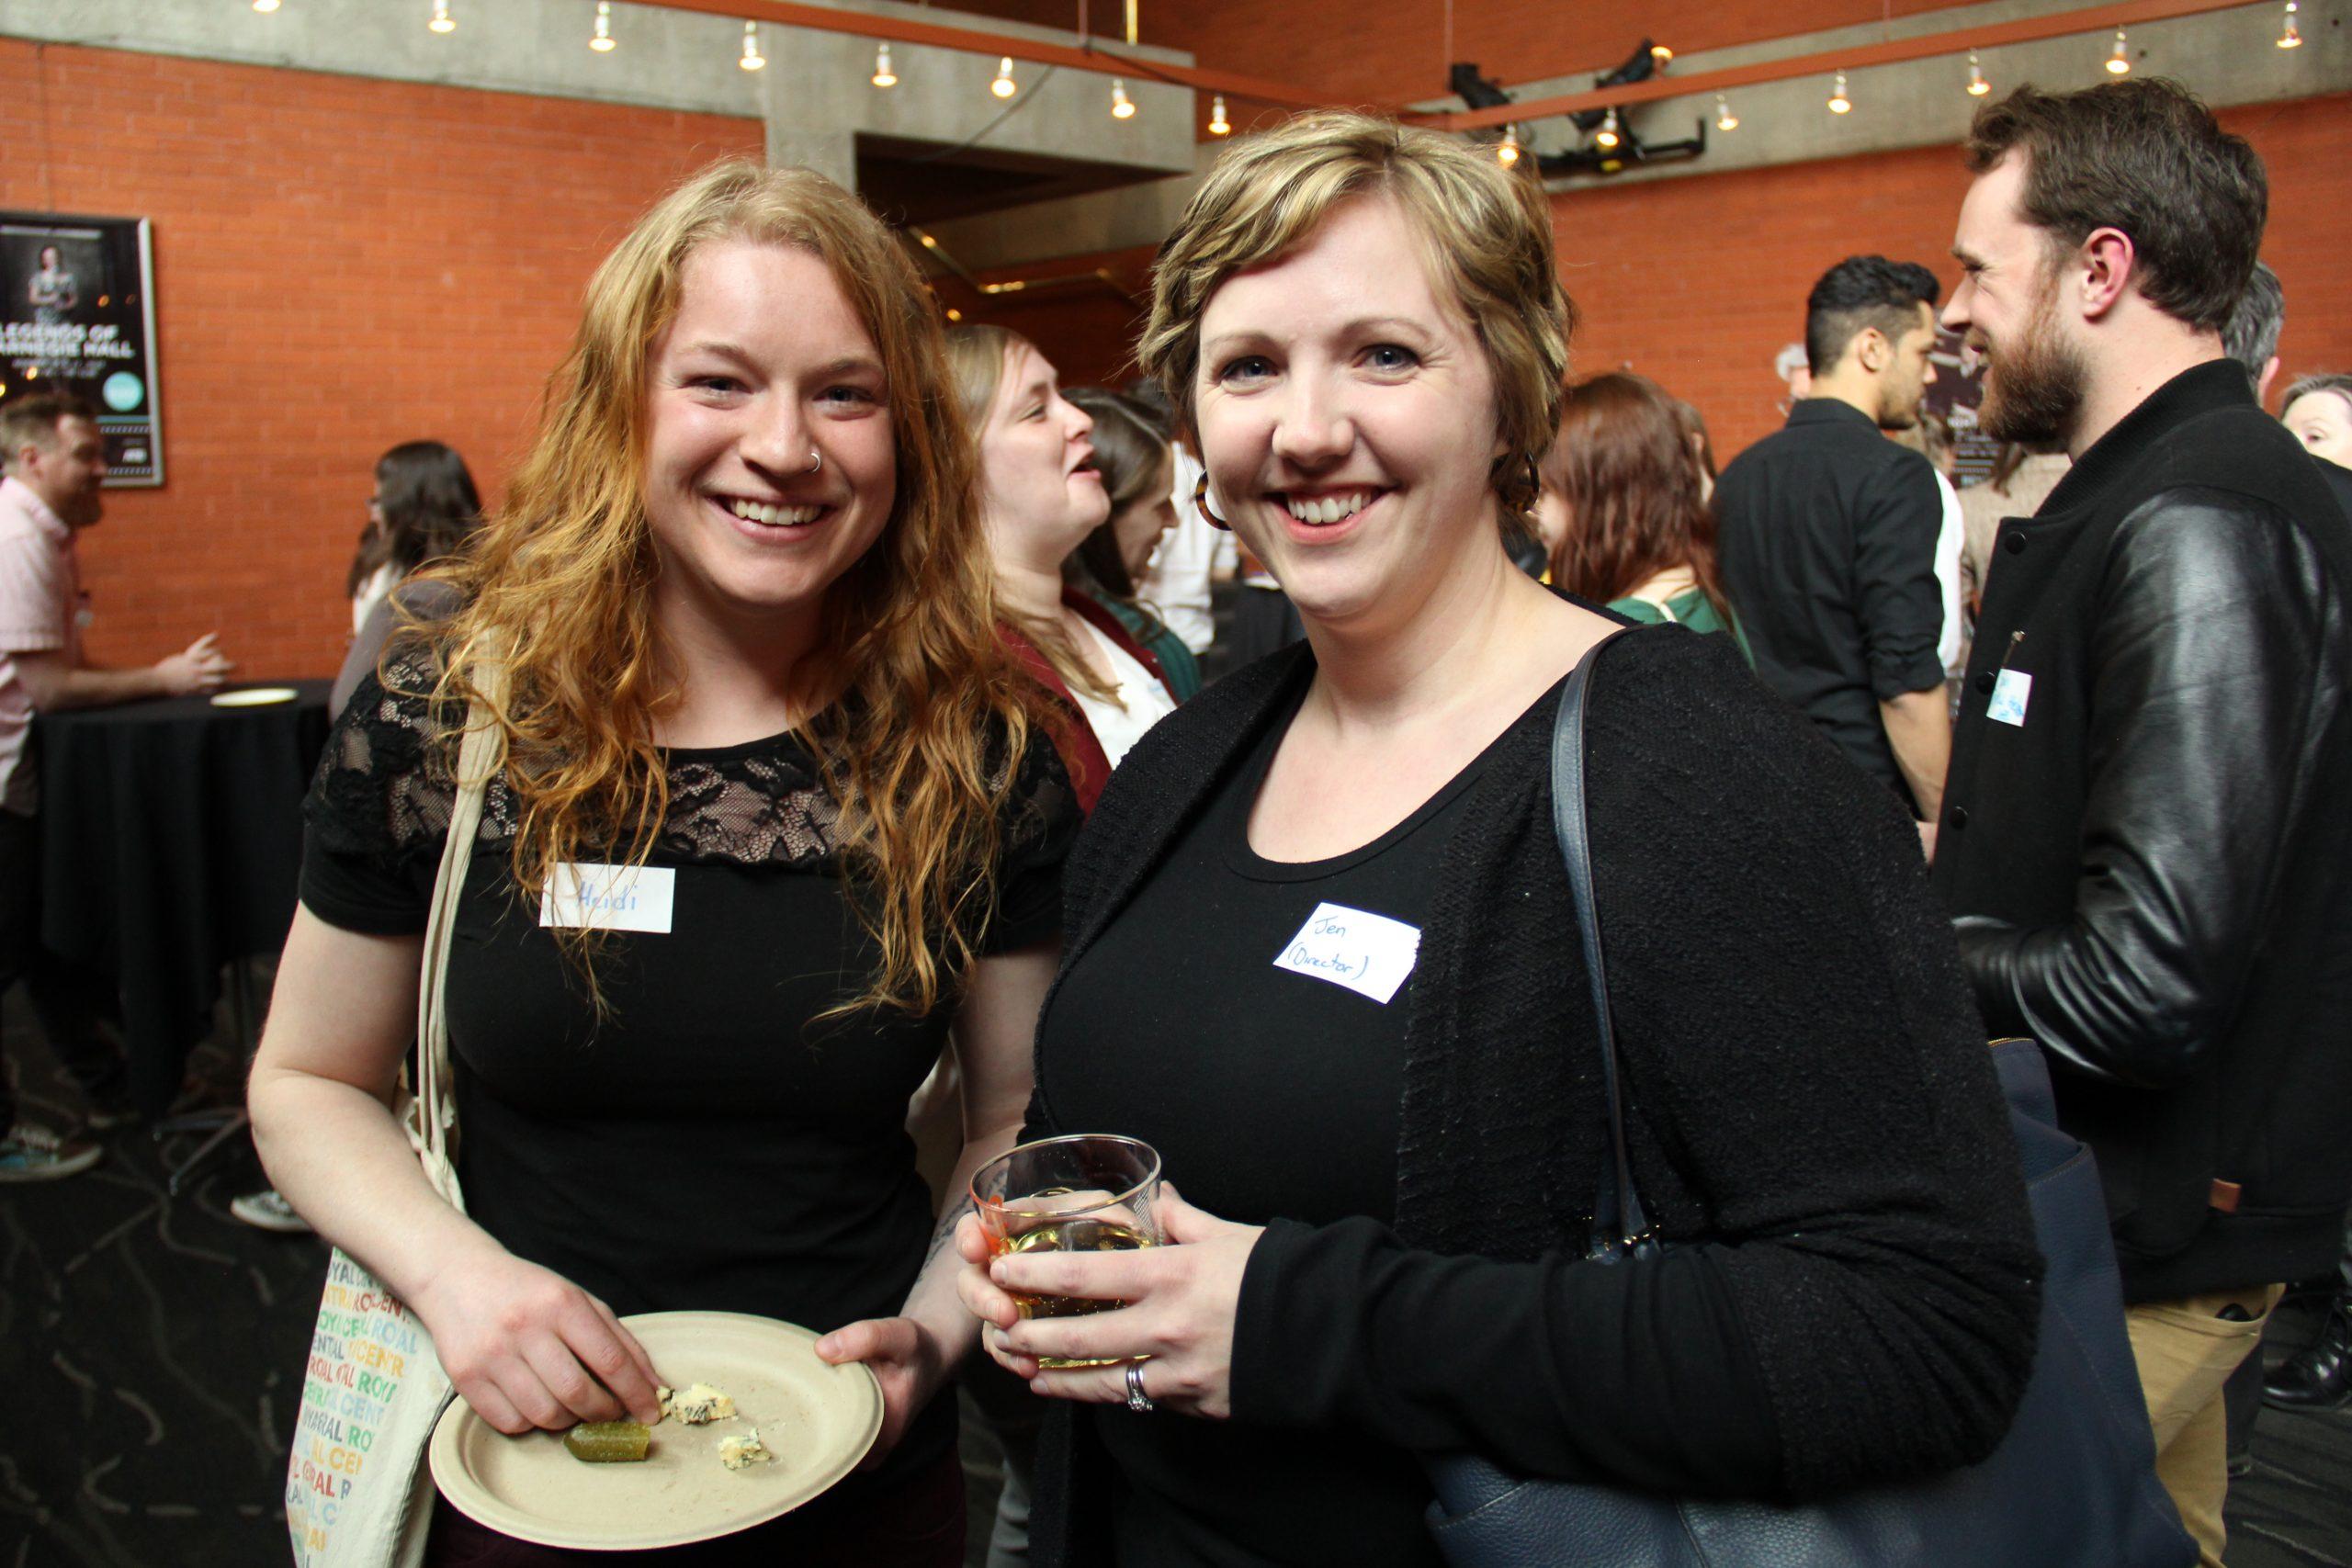 two white women wearing black at Emerge 2016 meet and greet, smiling while enjoying food and drink